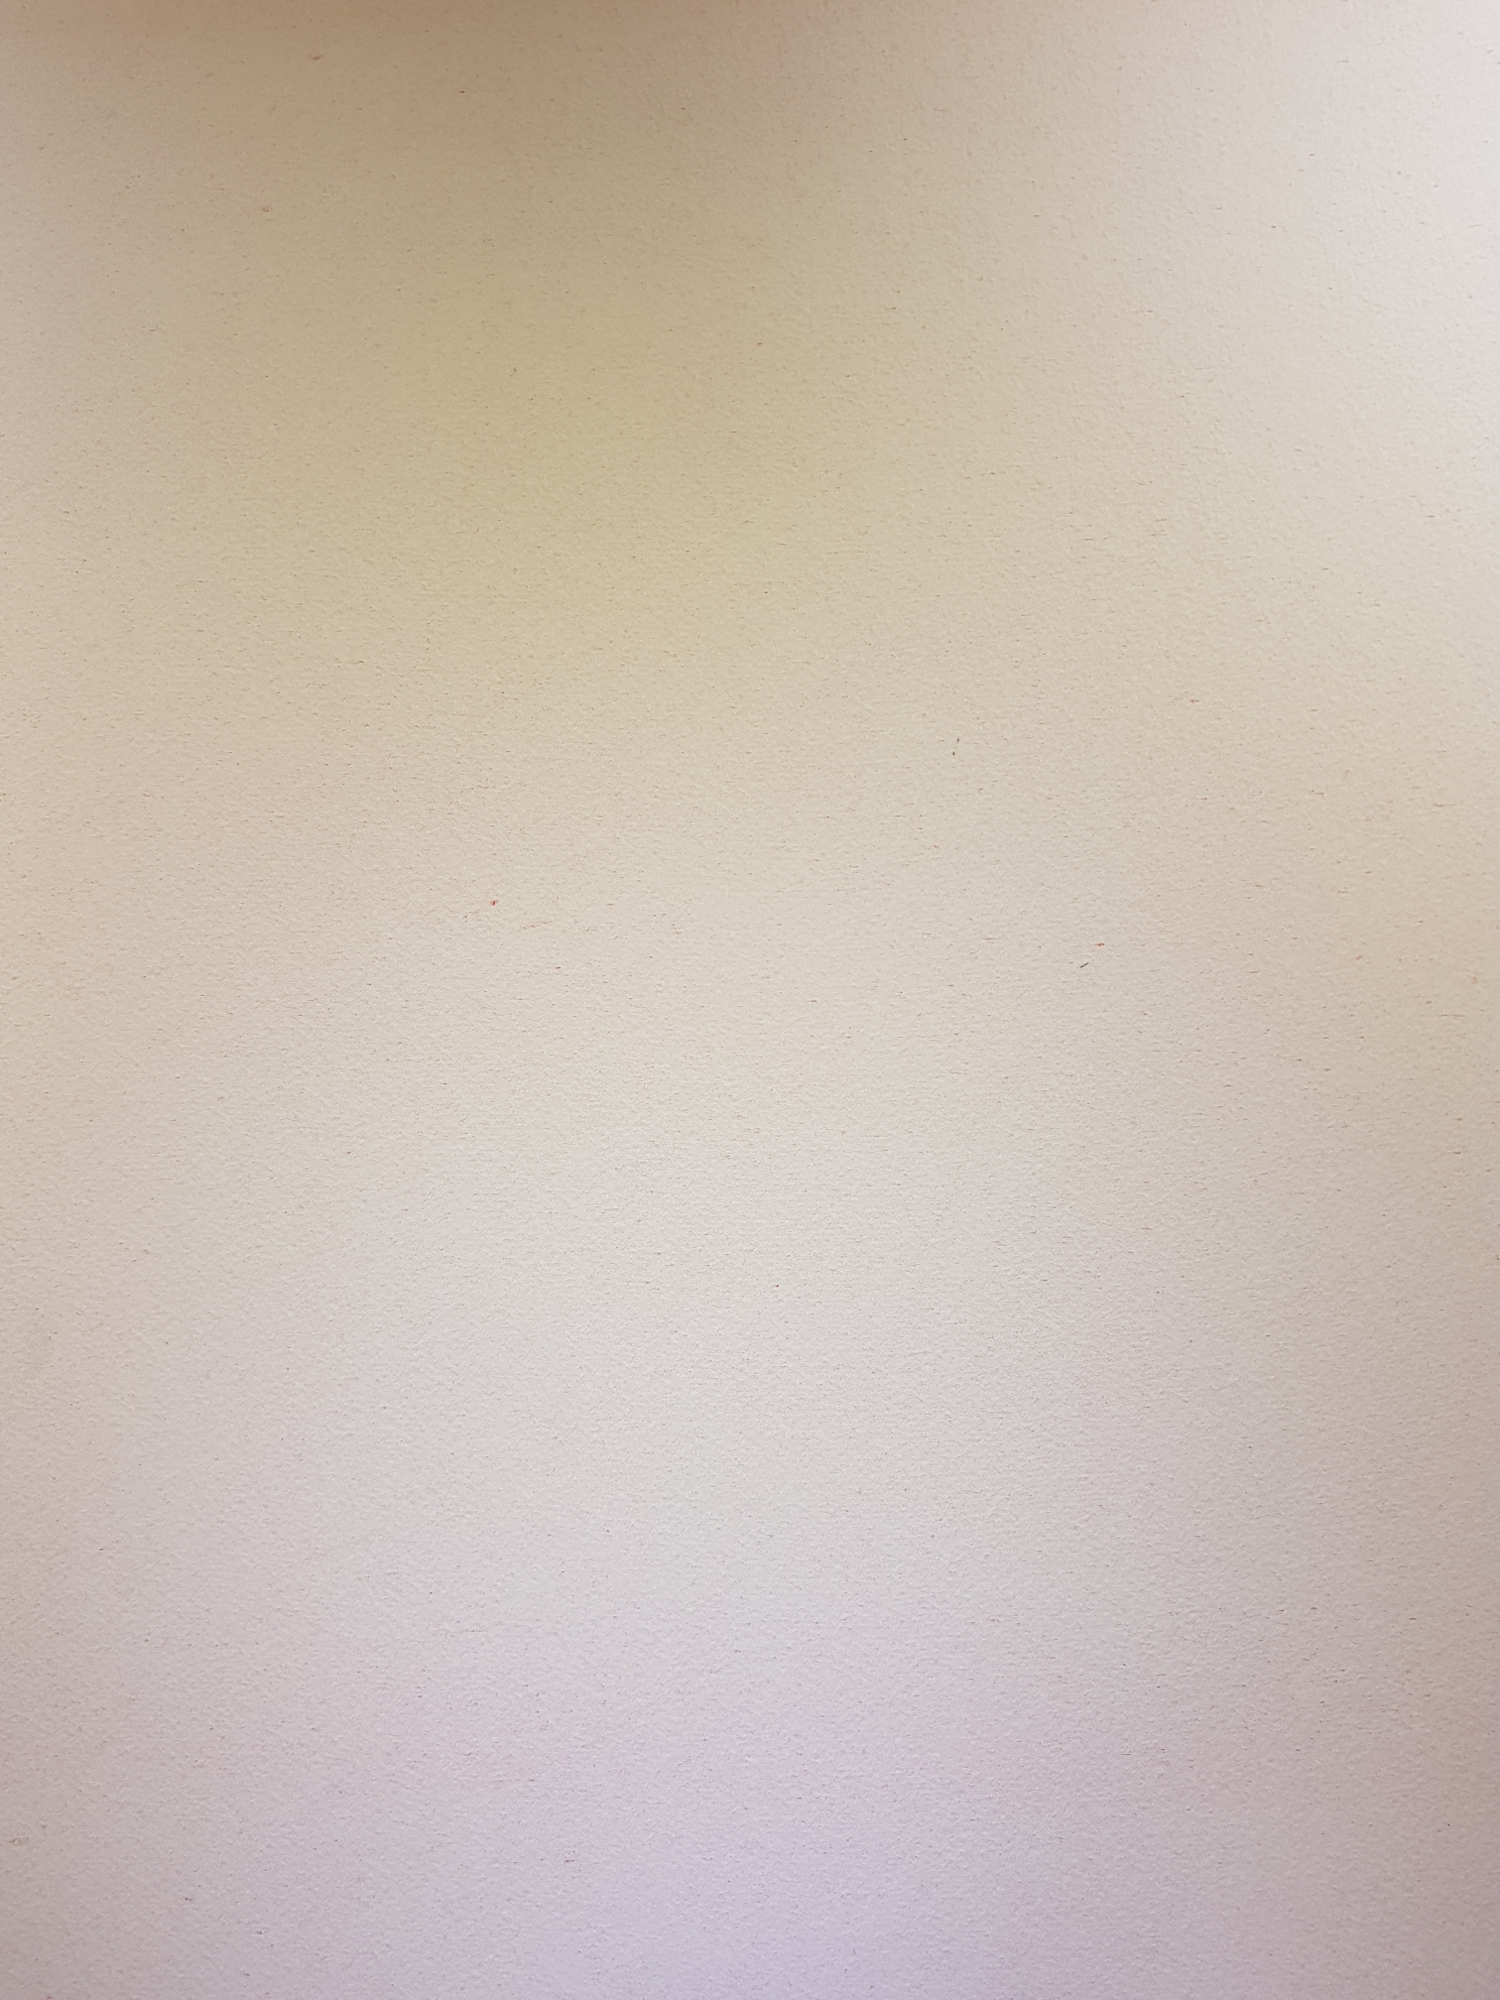 Оборот. Янкилевский Владимир Борисович. Без названия №1. Из цикла Женщина у моря